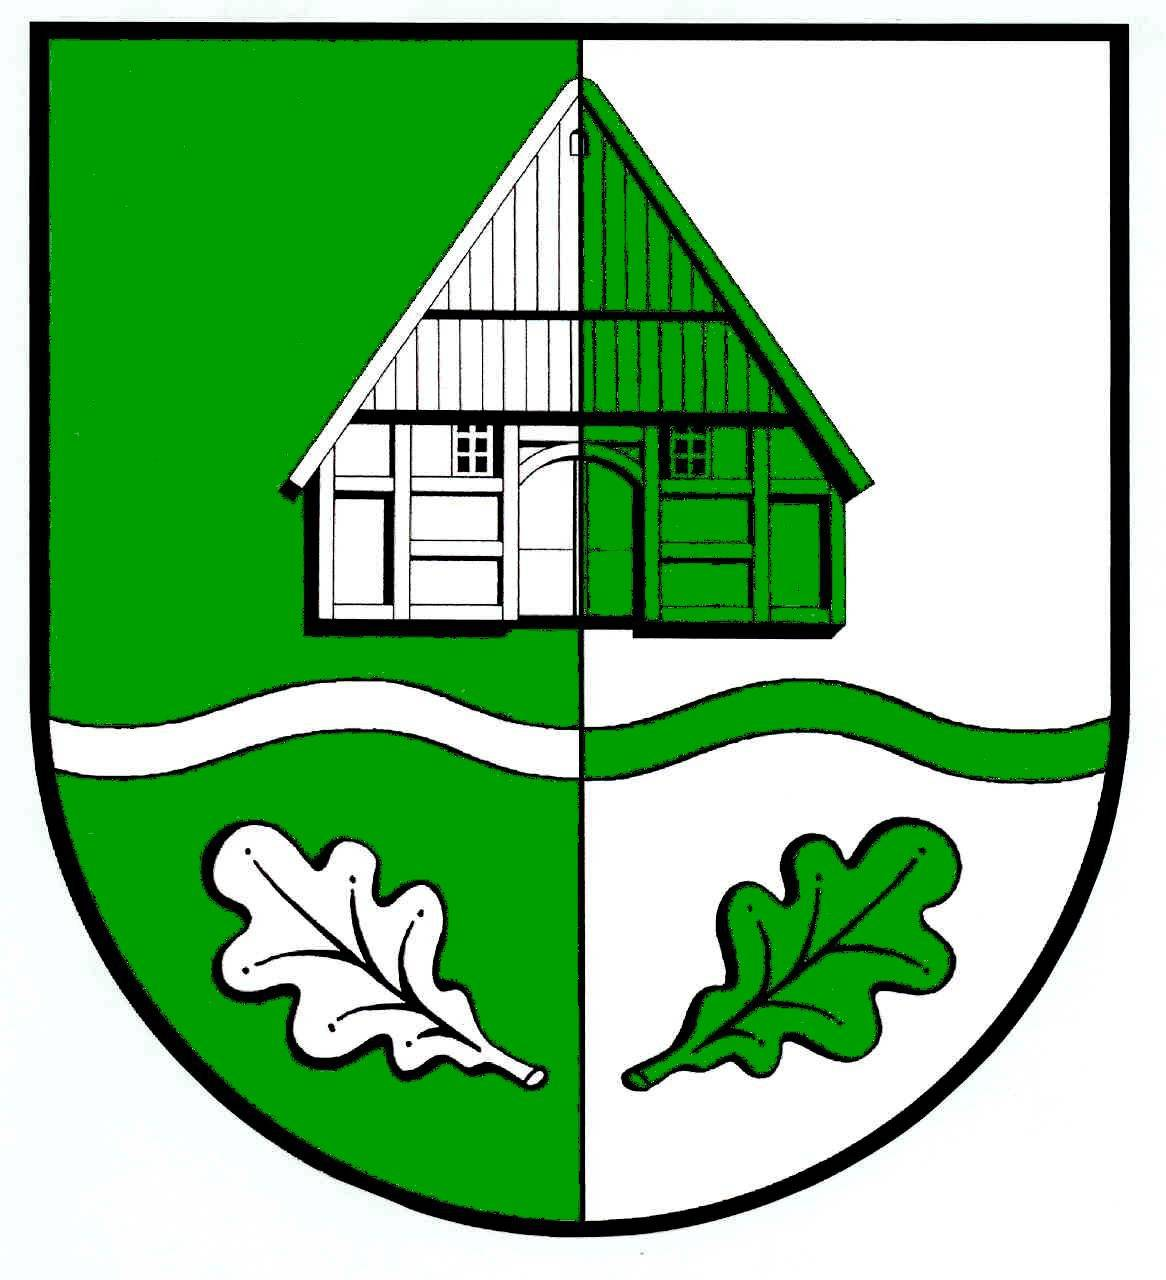 Wappen GemeindeArpsdorf, Kreis Rendsburg-Eckernförde